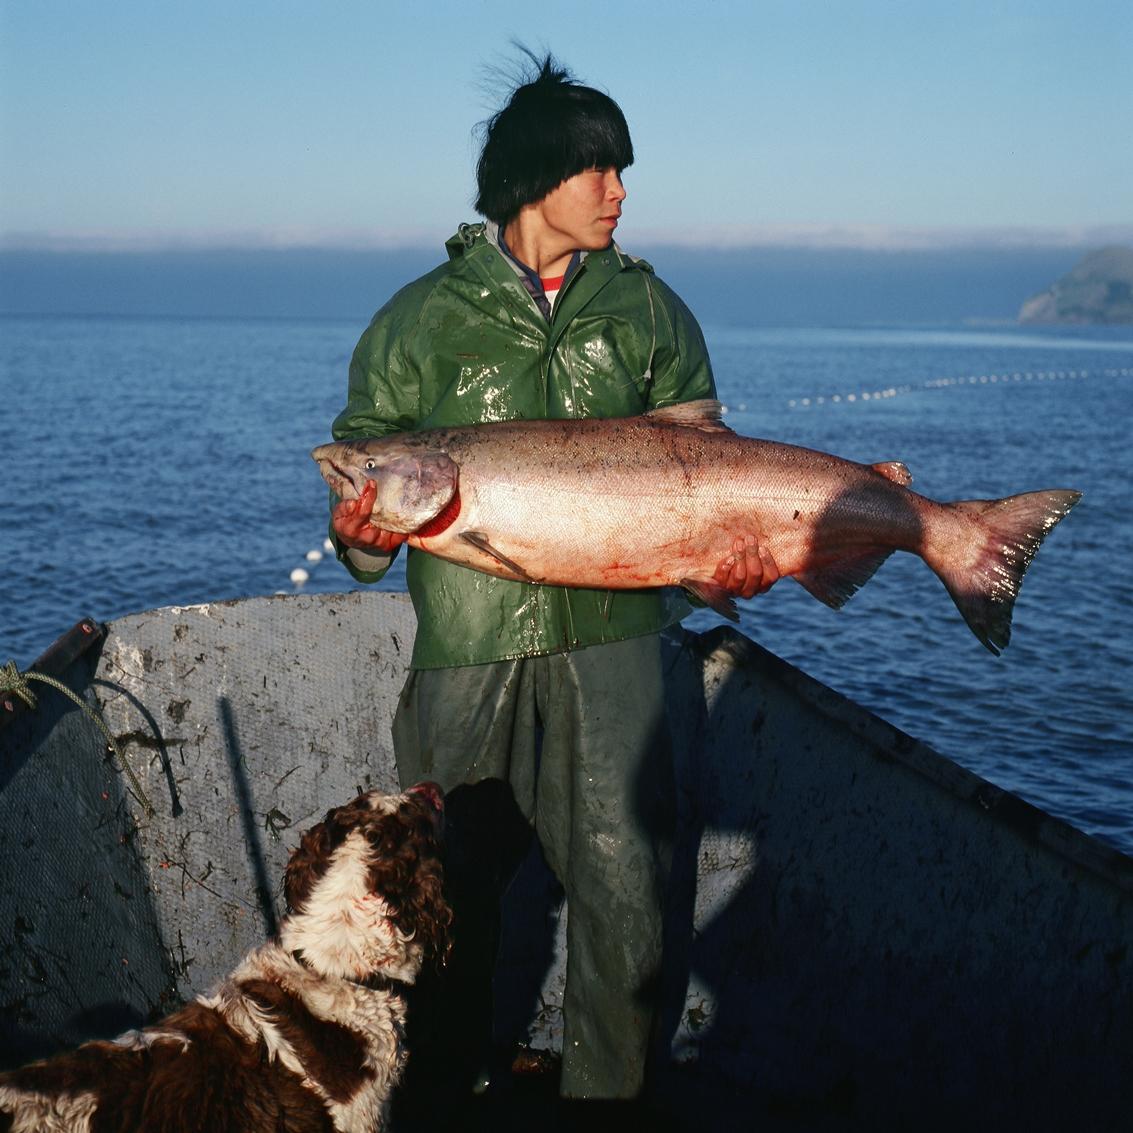 alaskan man with fish